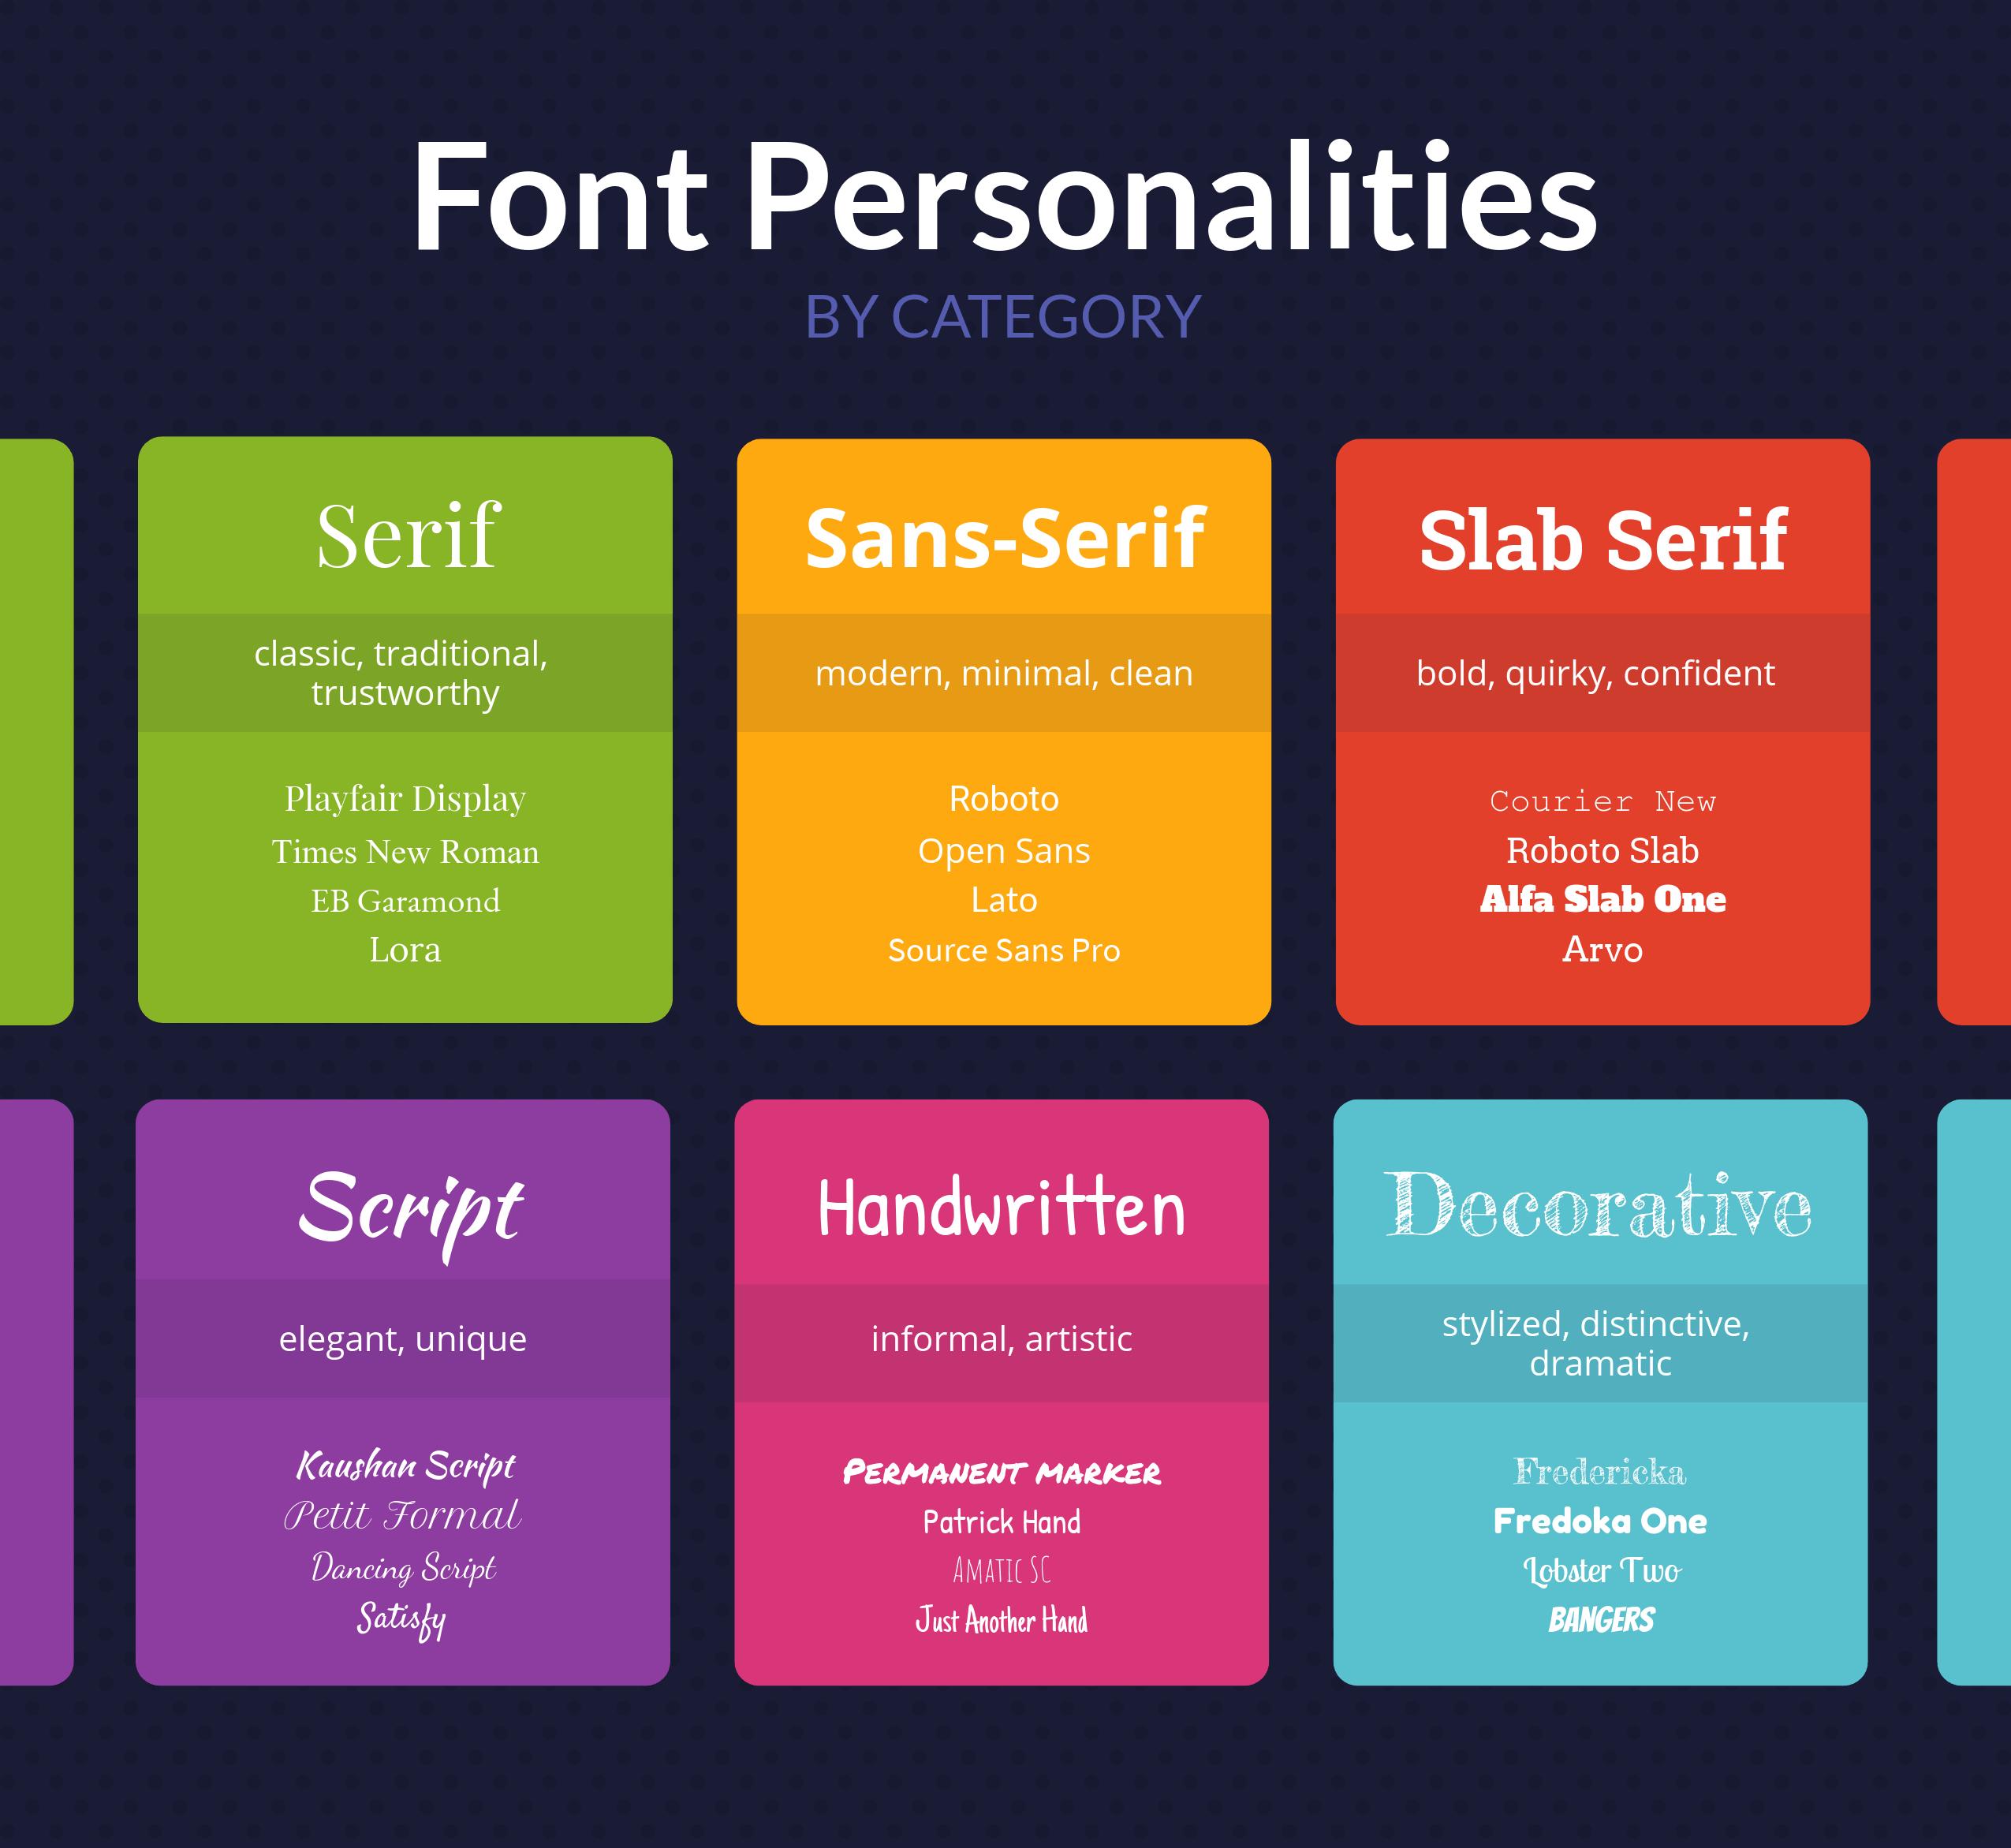 font-categories-personalities